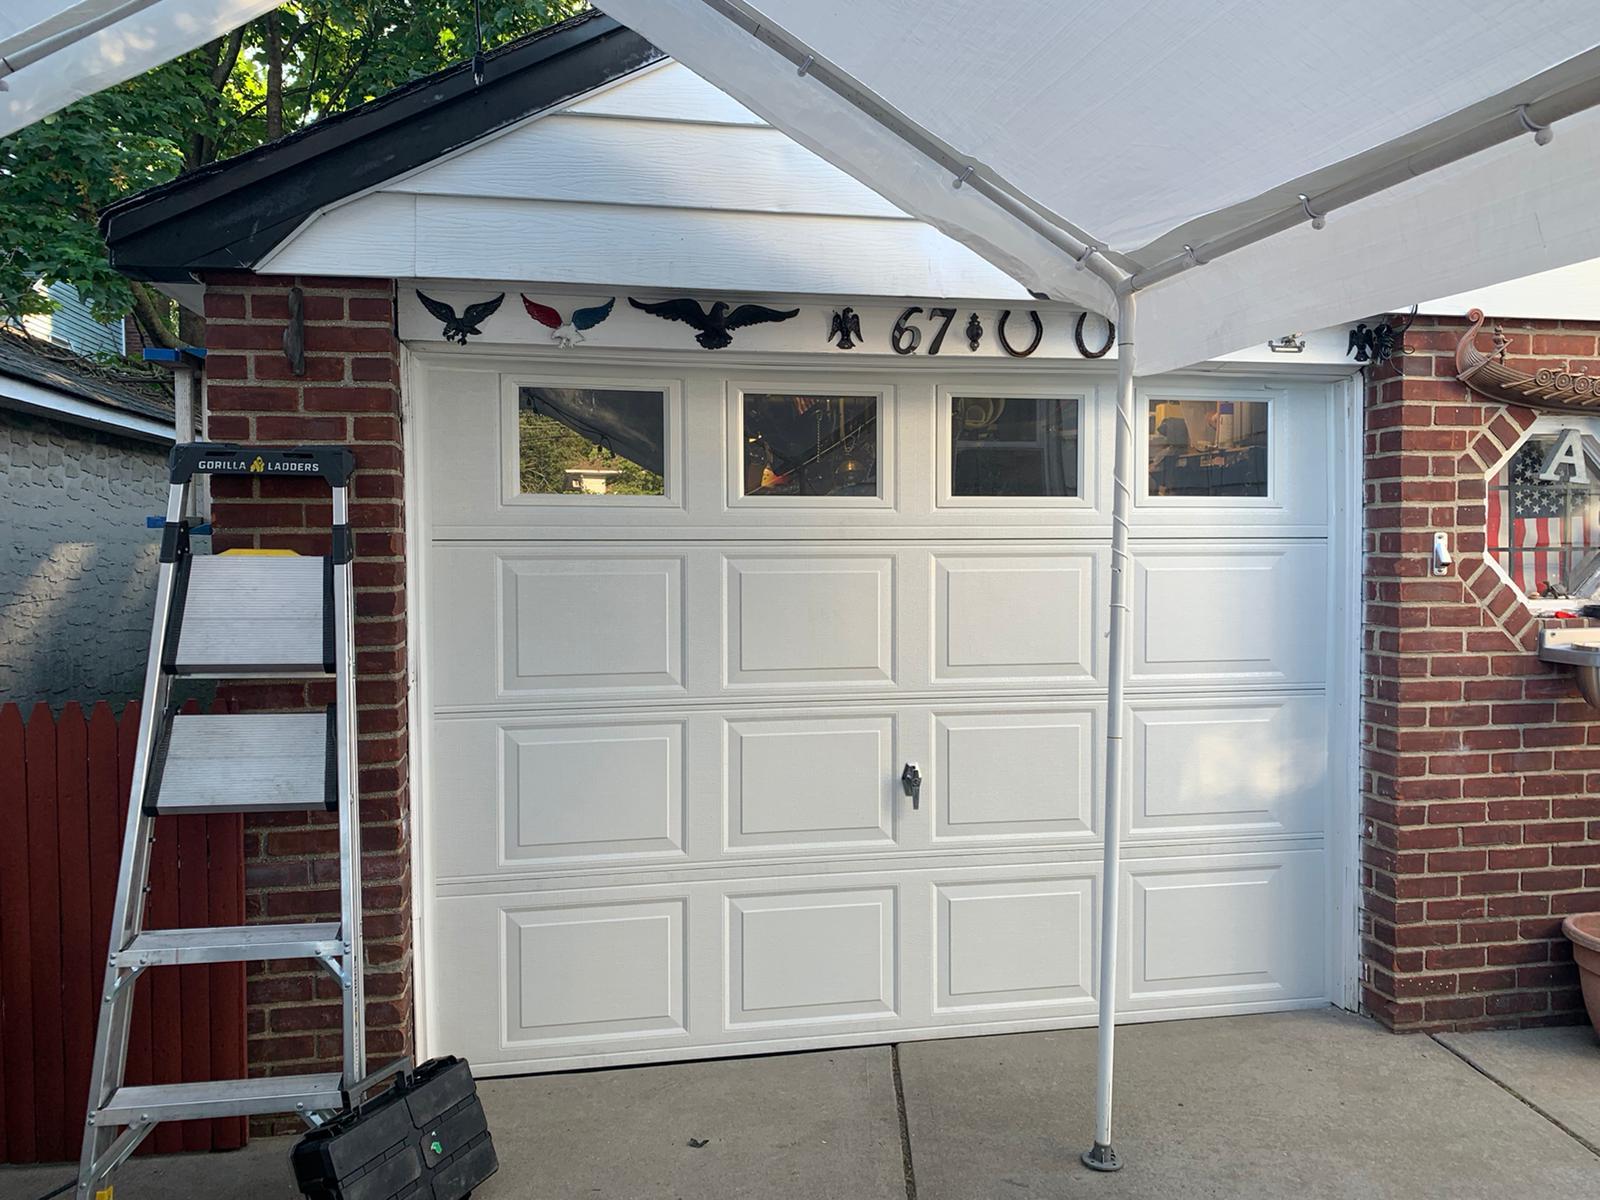 Garage Door Repair & Installation in Hicksville, Oyster Bay